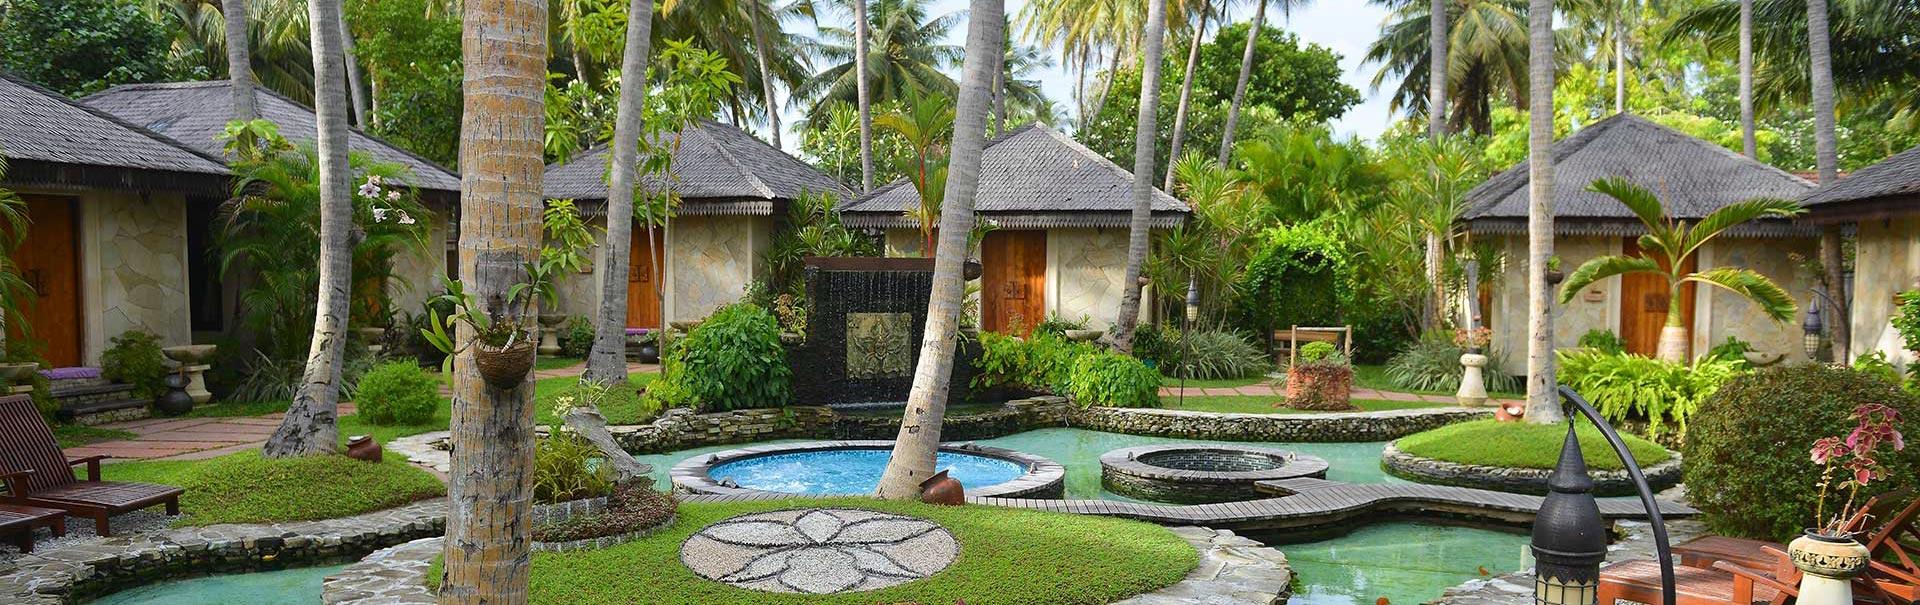 imageUrlhttps://img.veenaworld.com/customized-holidays/world/maldives/shml10/shml10-bnn-1.jpg